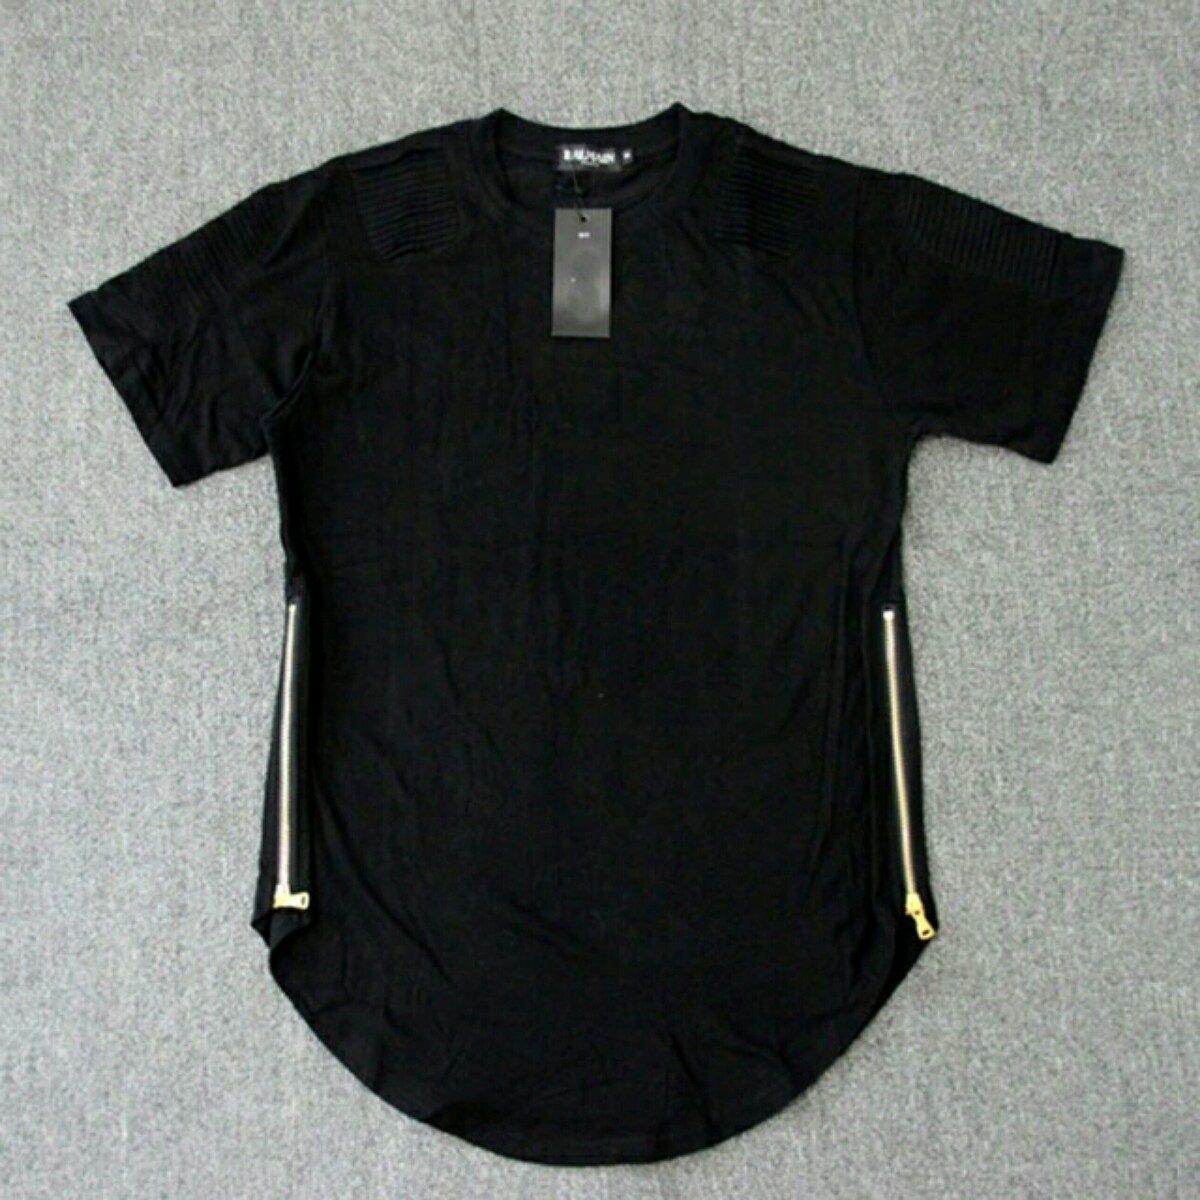 f376a42c6 camiseta oversized long line com ziper masculina feminina. Carregando zoom.